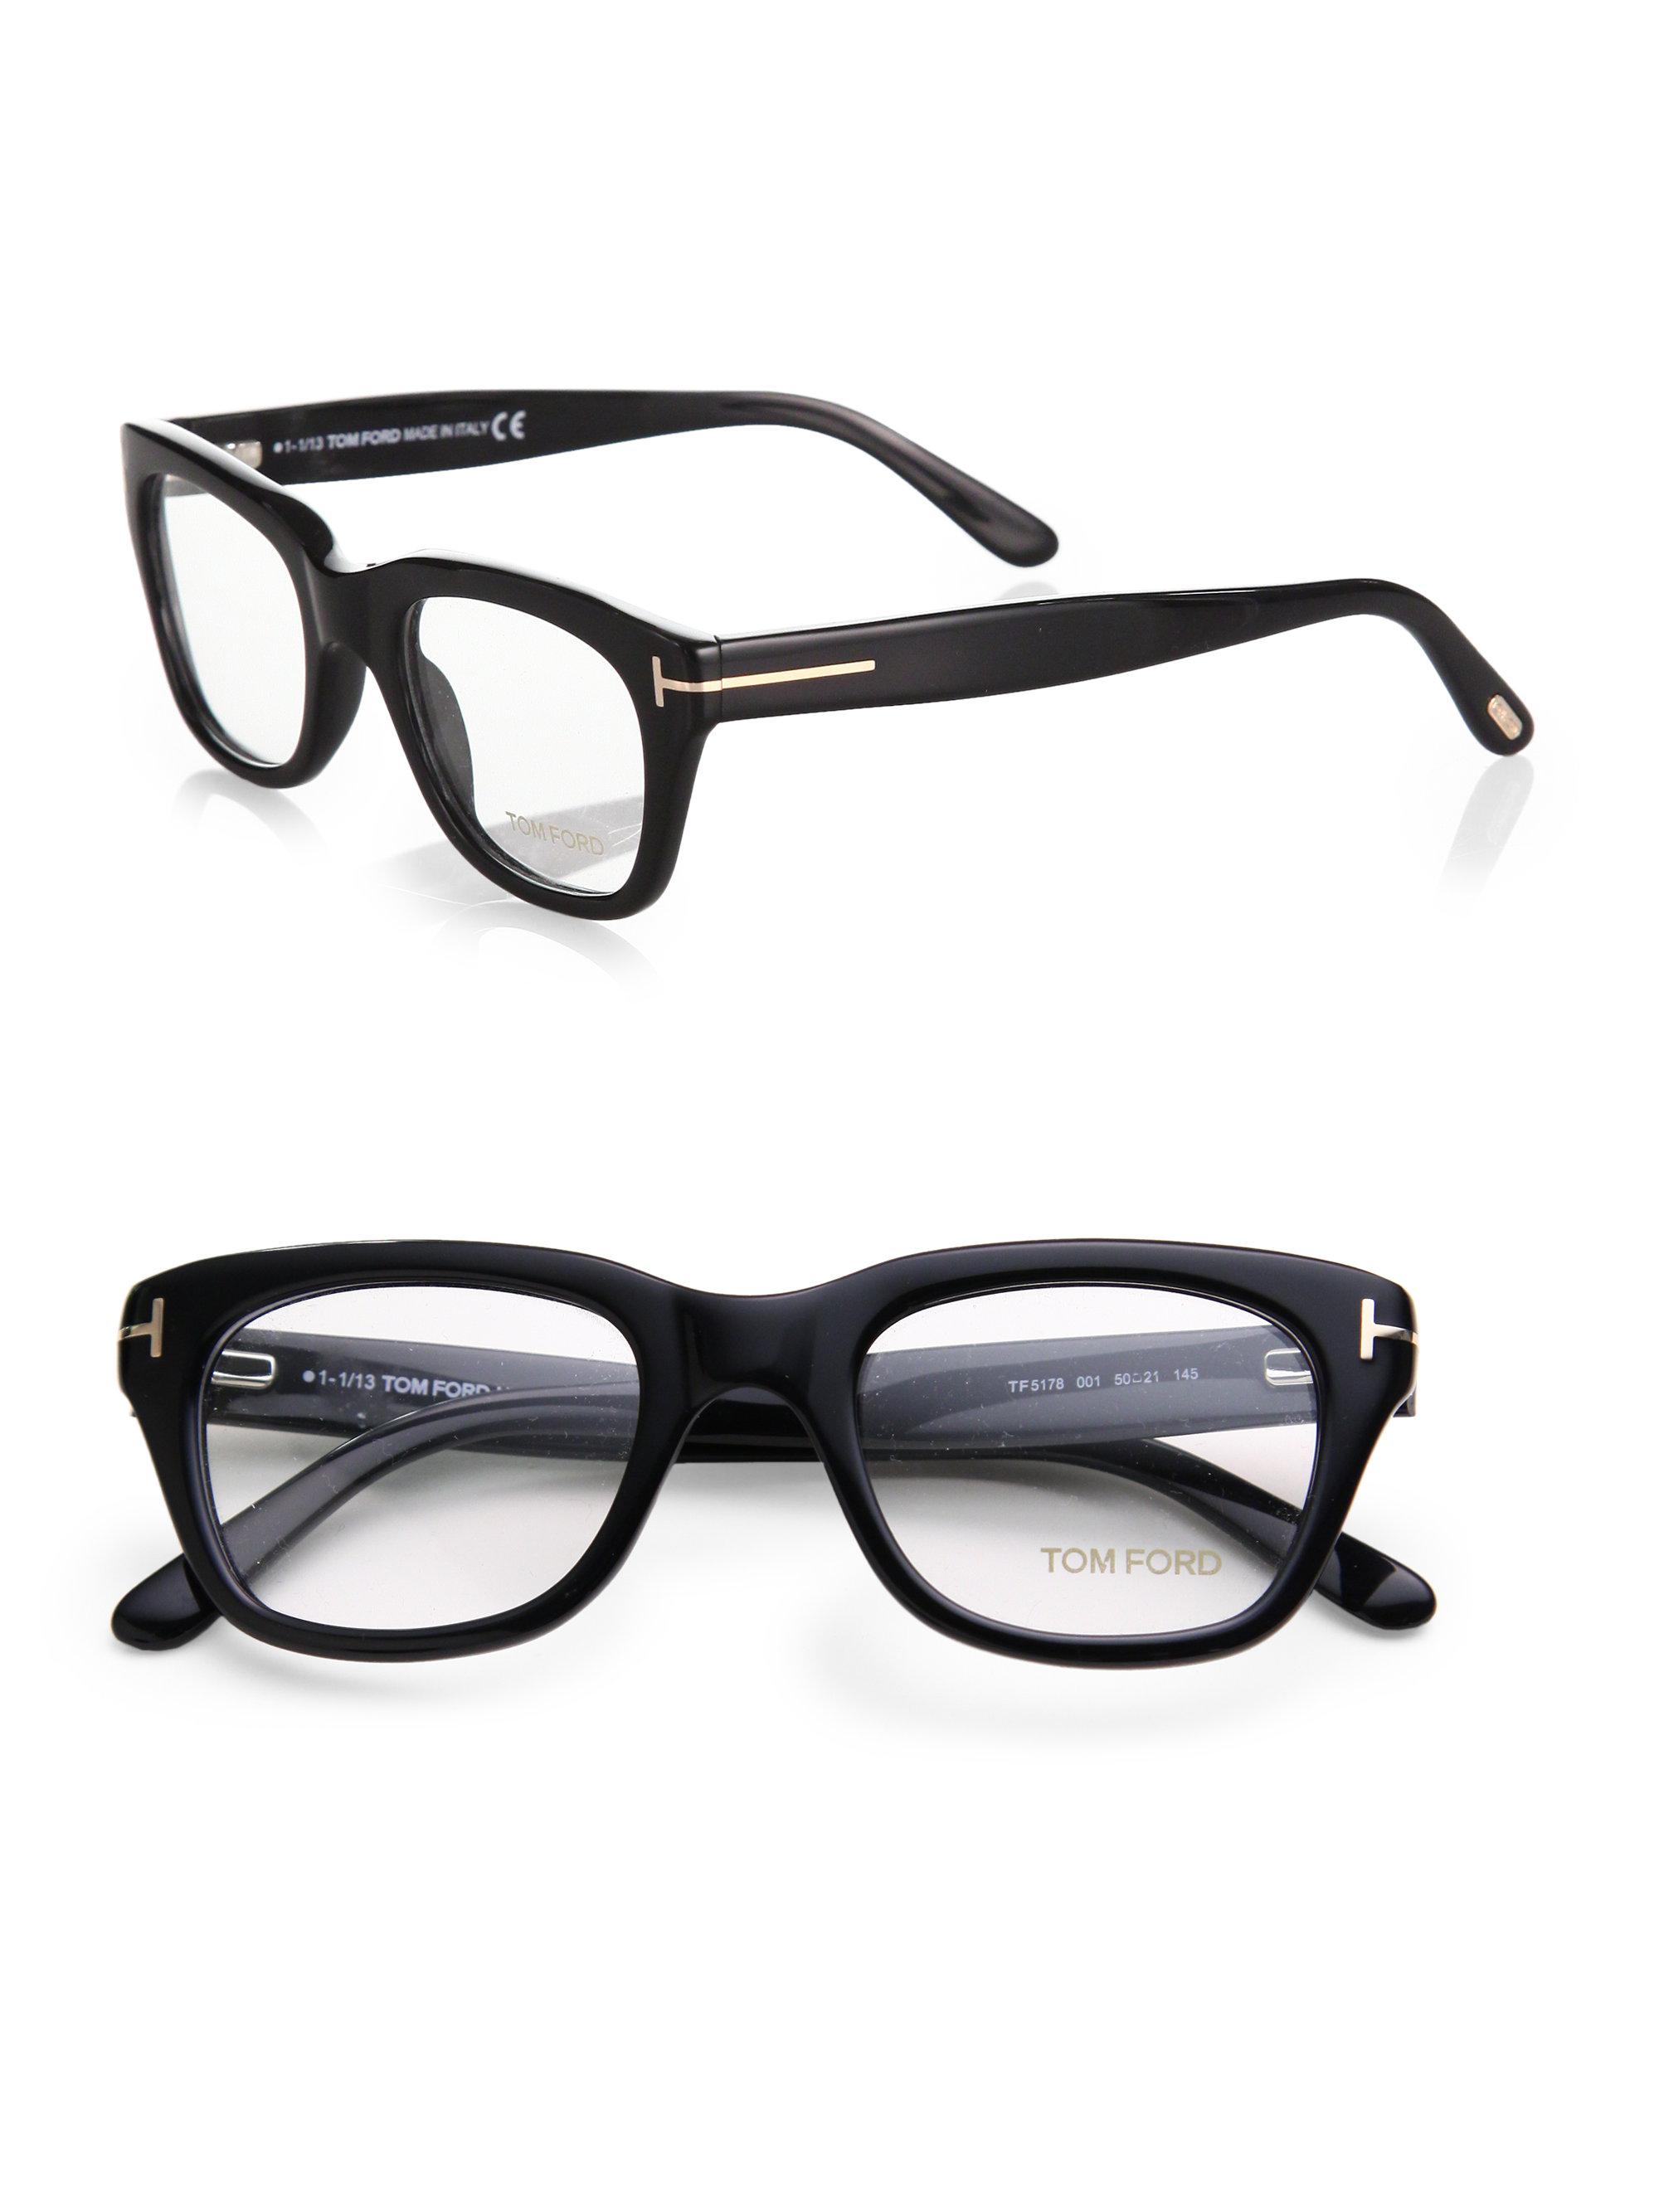 19df4807524 Lyst - Tom Ford 5178 Square Optical Frames in Black for Men